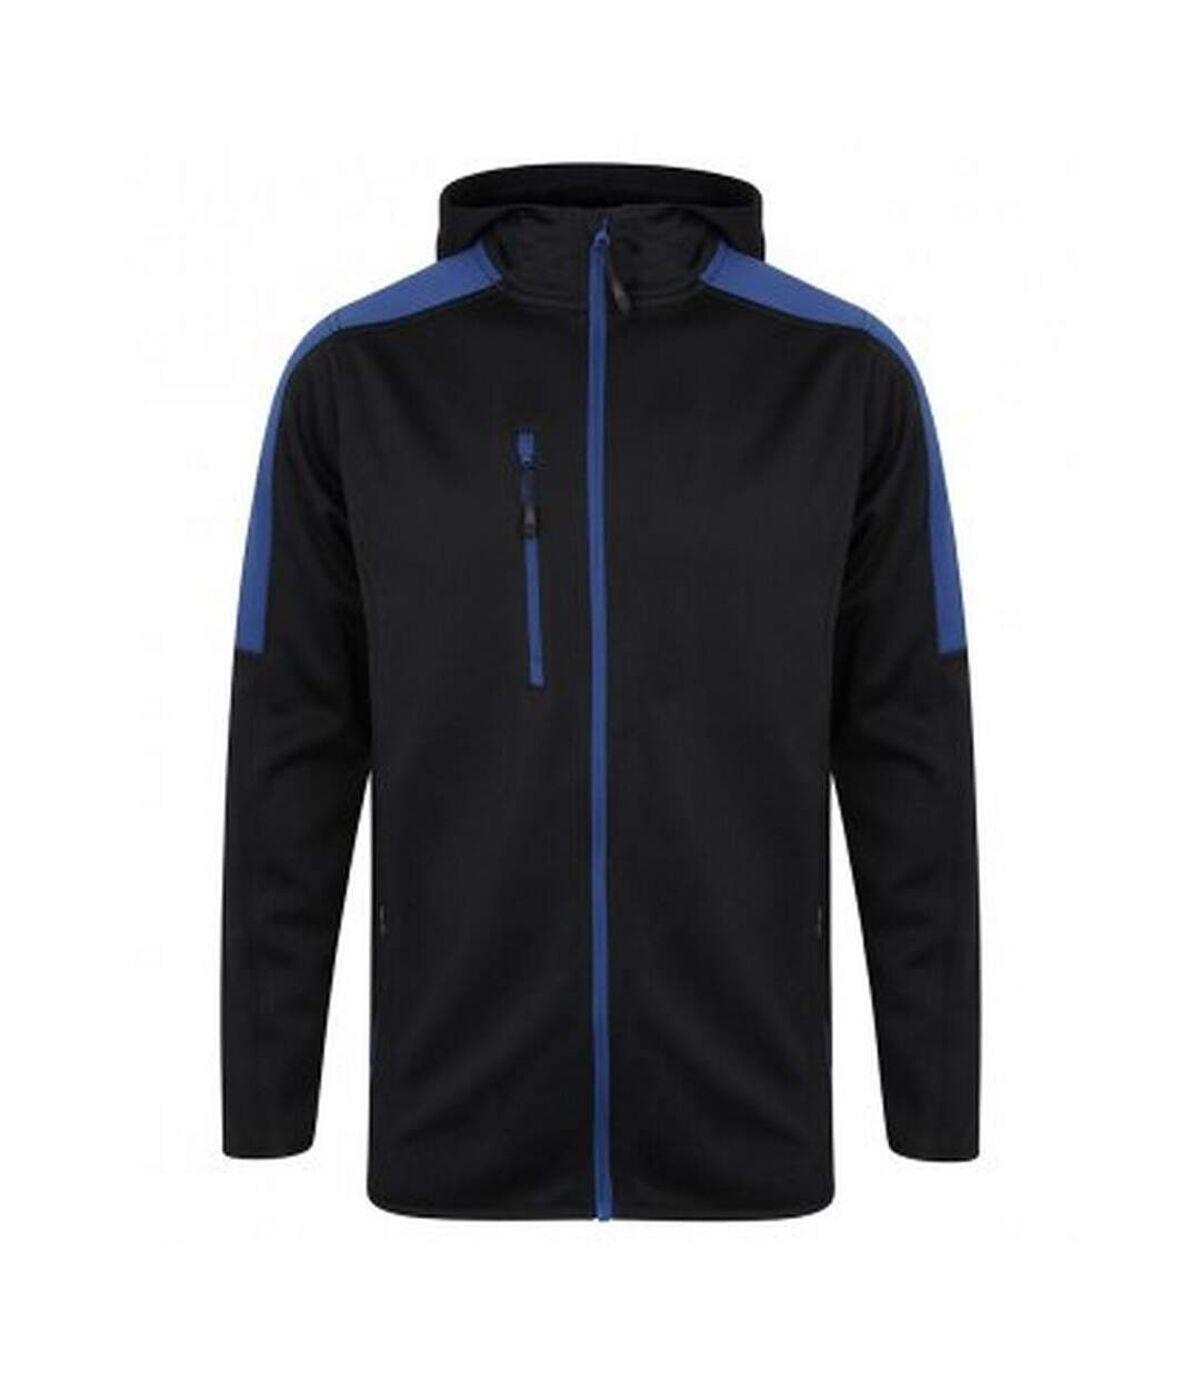 Finden & Hales Mens Active Soft Shell Jacket (Navy/Royal) - UTPC3079